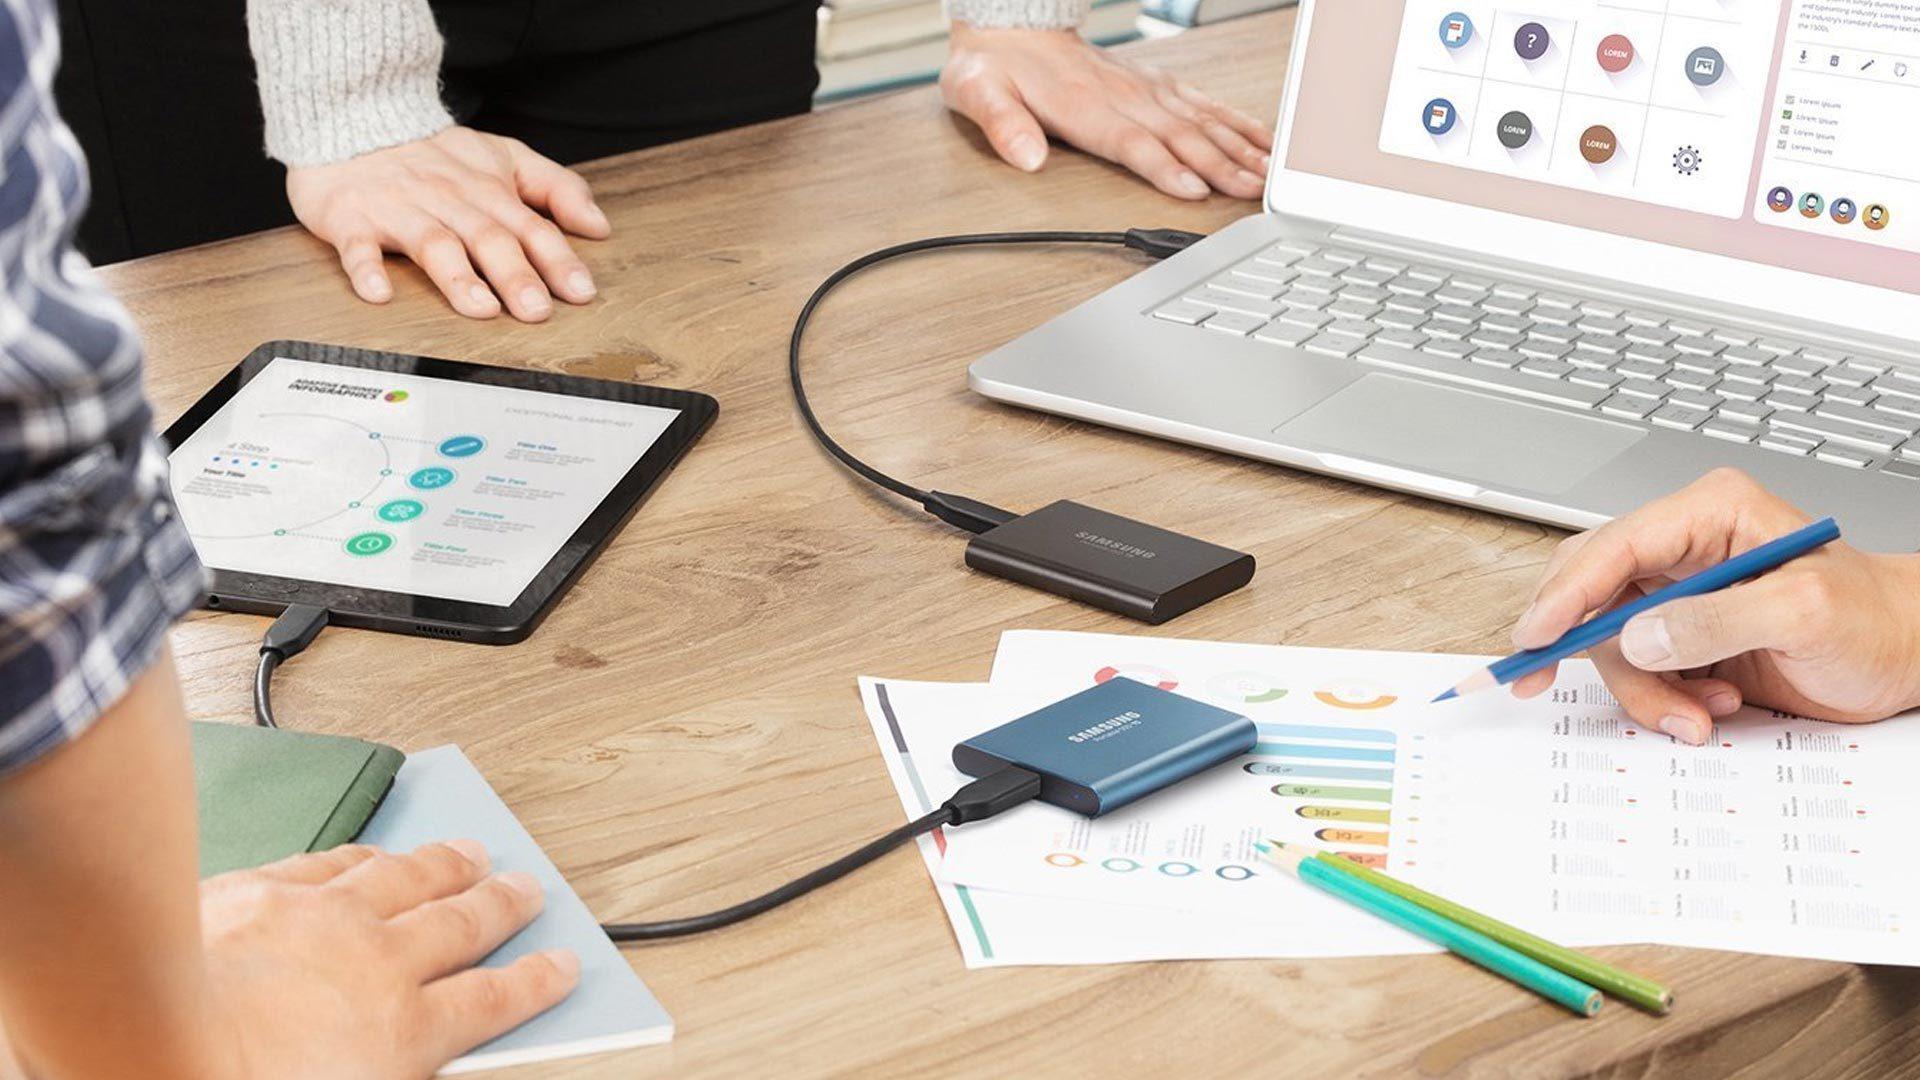 9to5Toys Last Call: Samsung 1TB USB-C SSD $270, iOttie